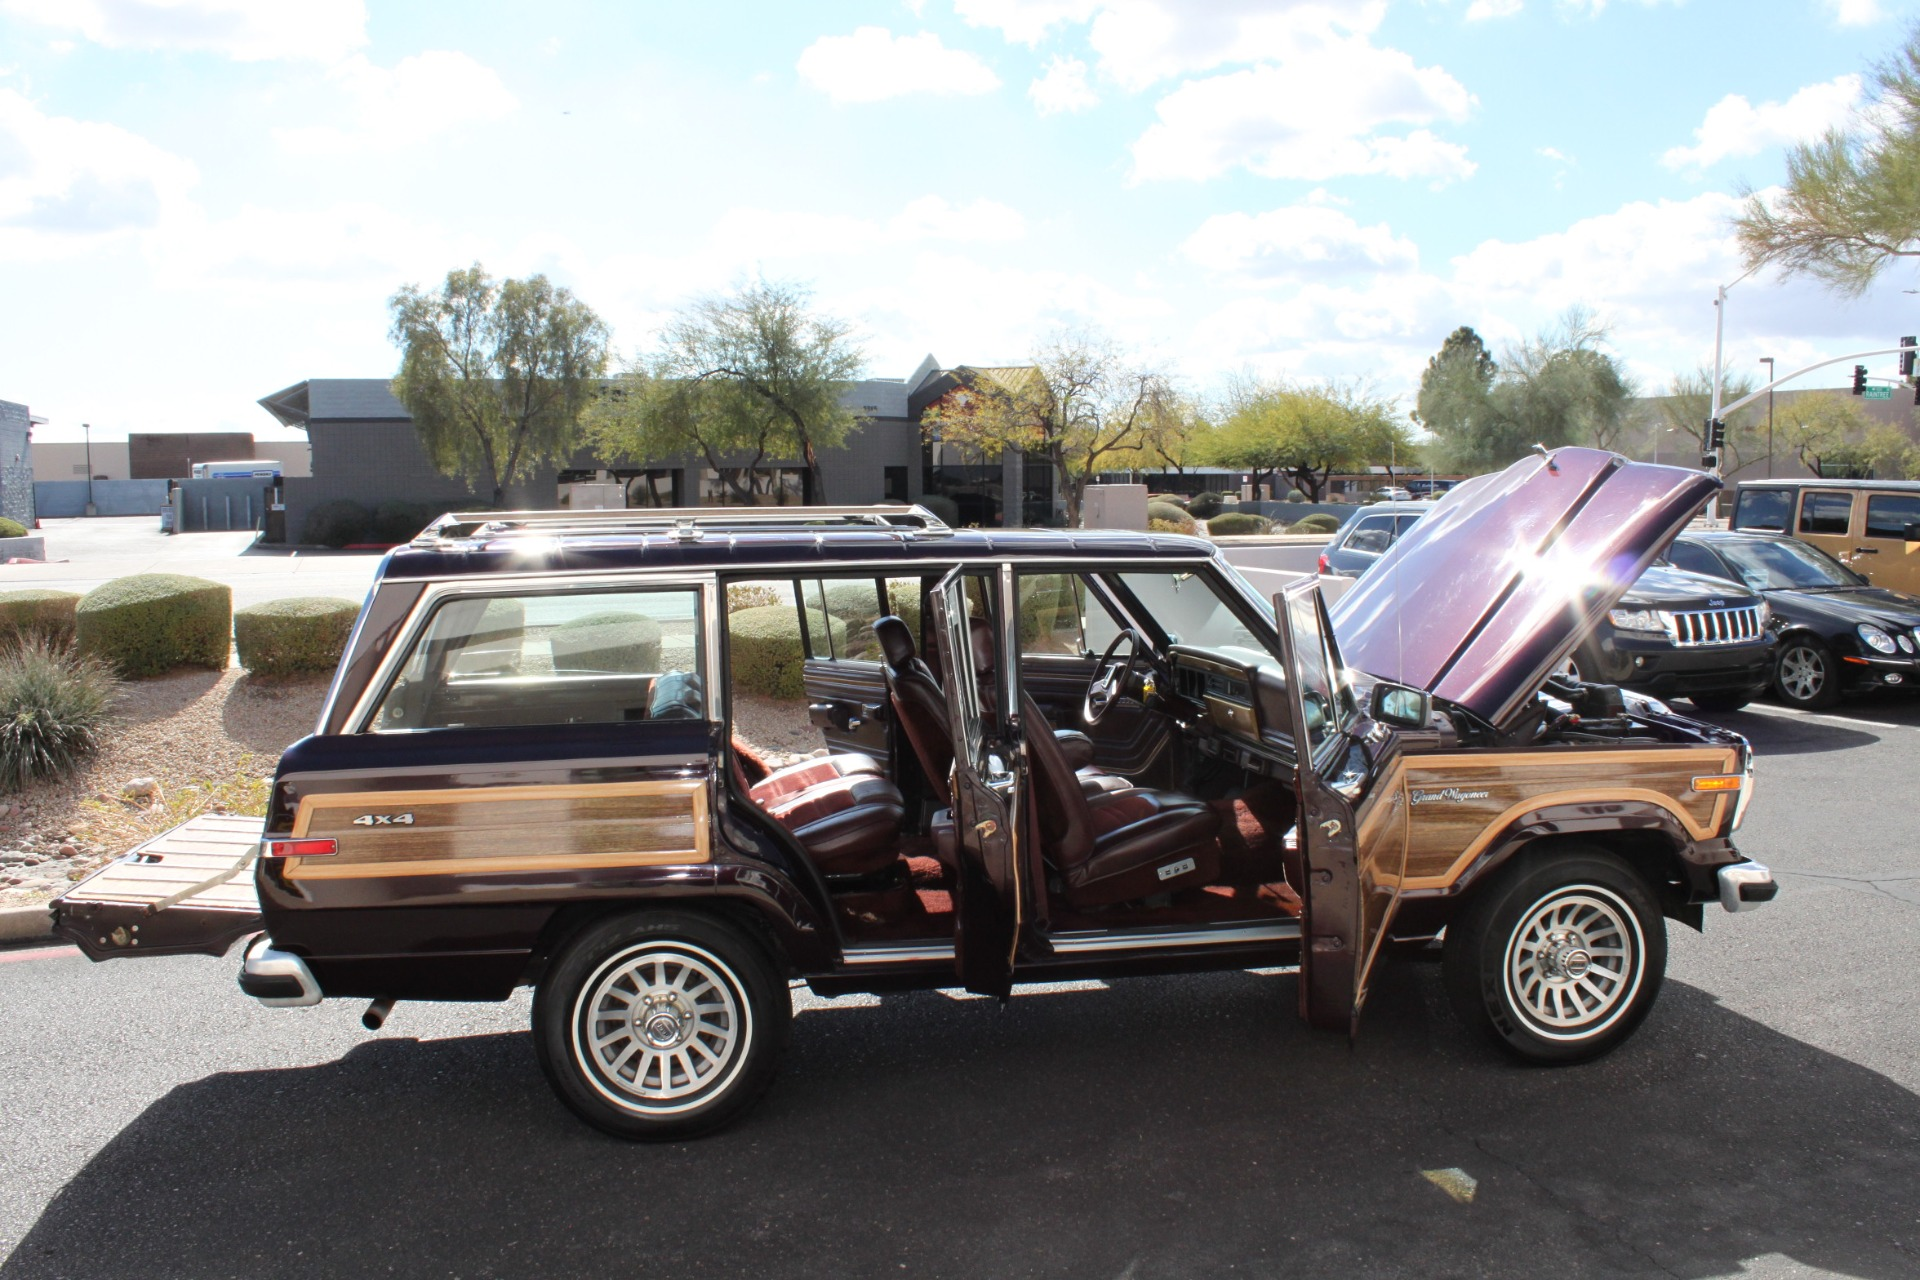 Used-1989-Jeep-Grand-Wagoneer-Land-Cruiser